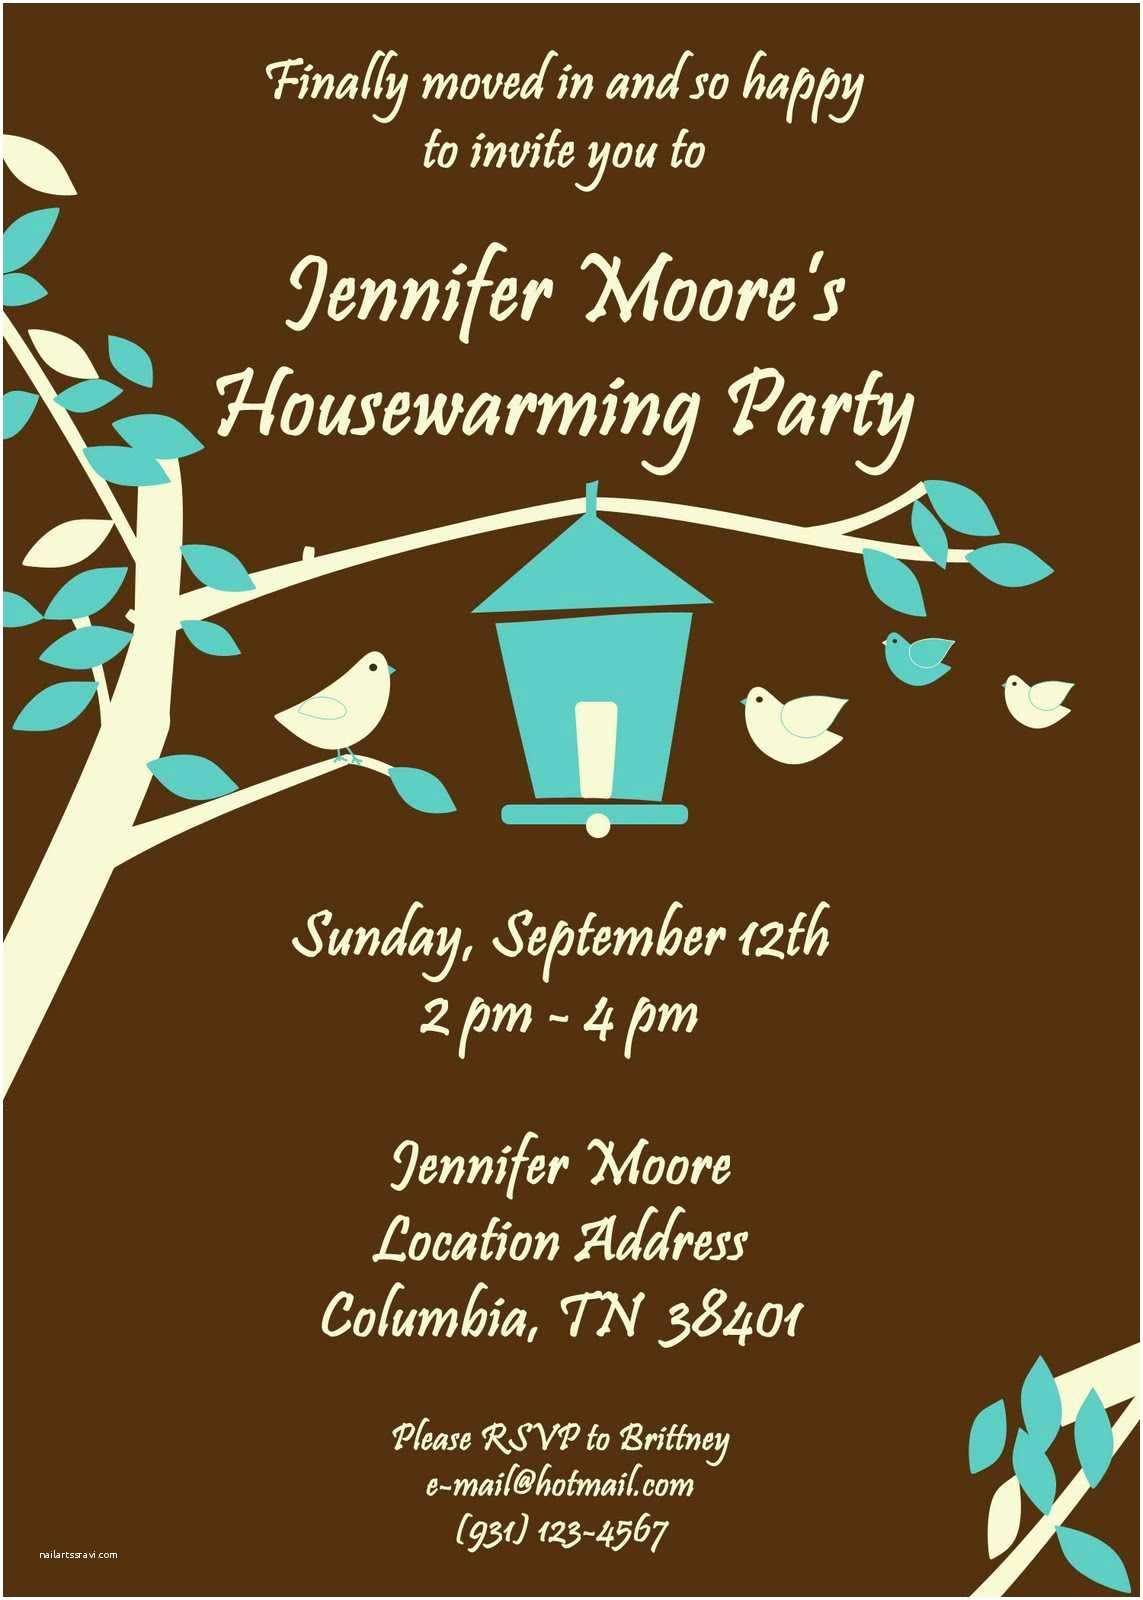 Housewarming Party Invitation Housewarming Party Invitation Sample